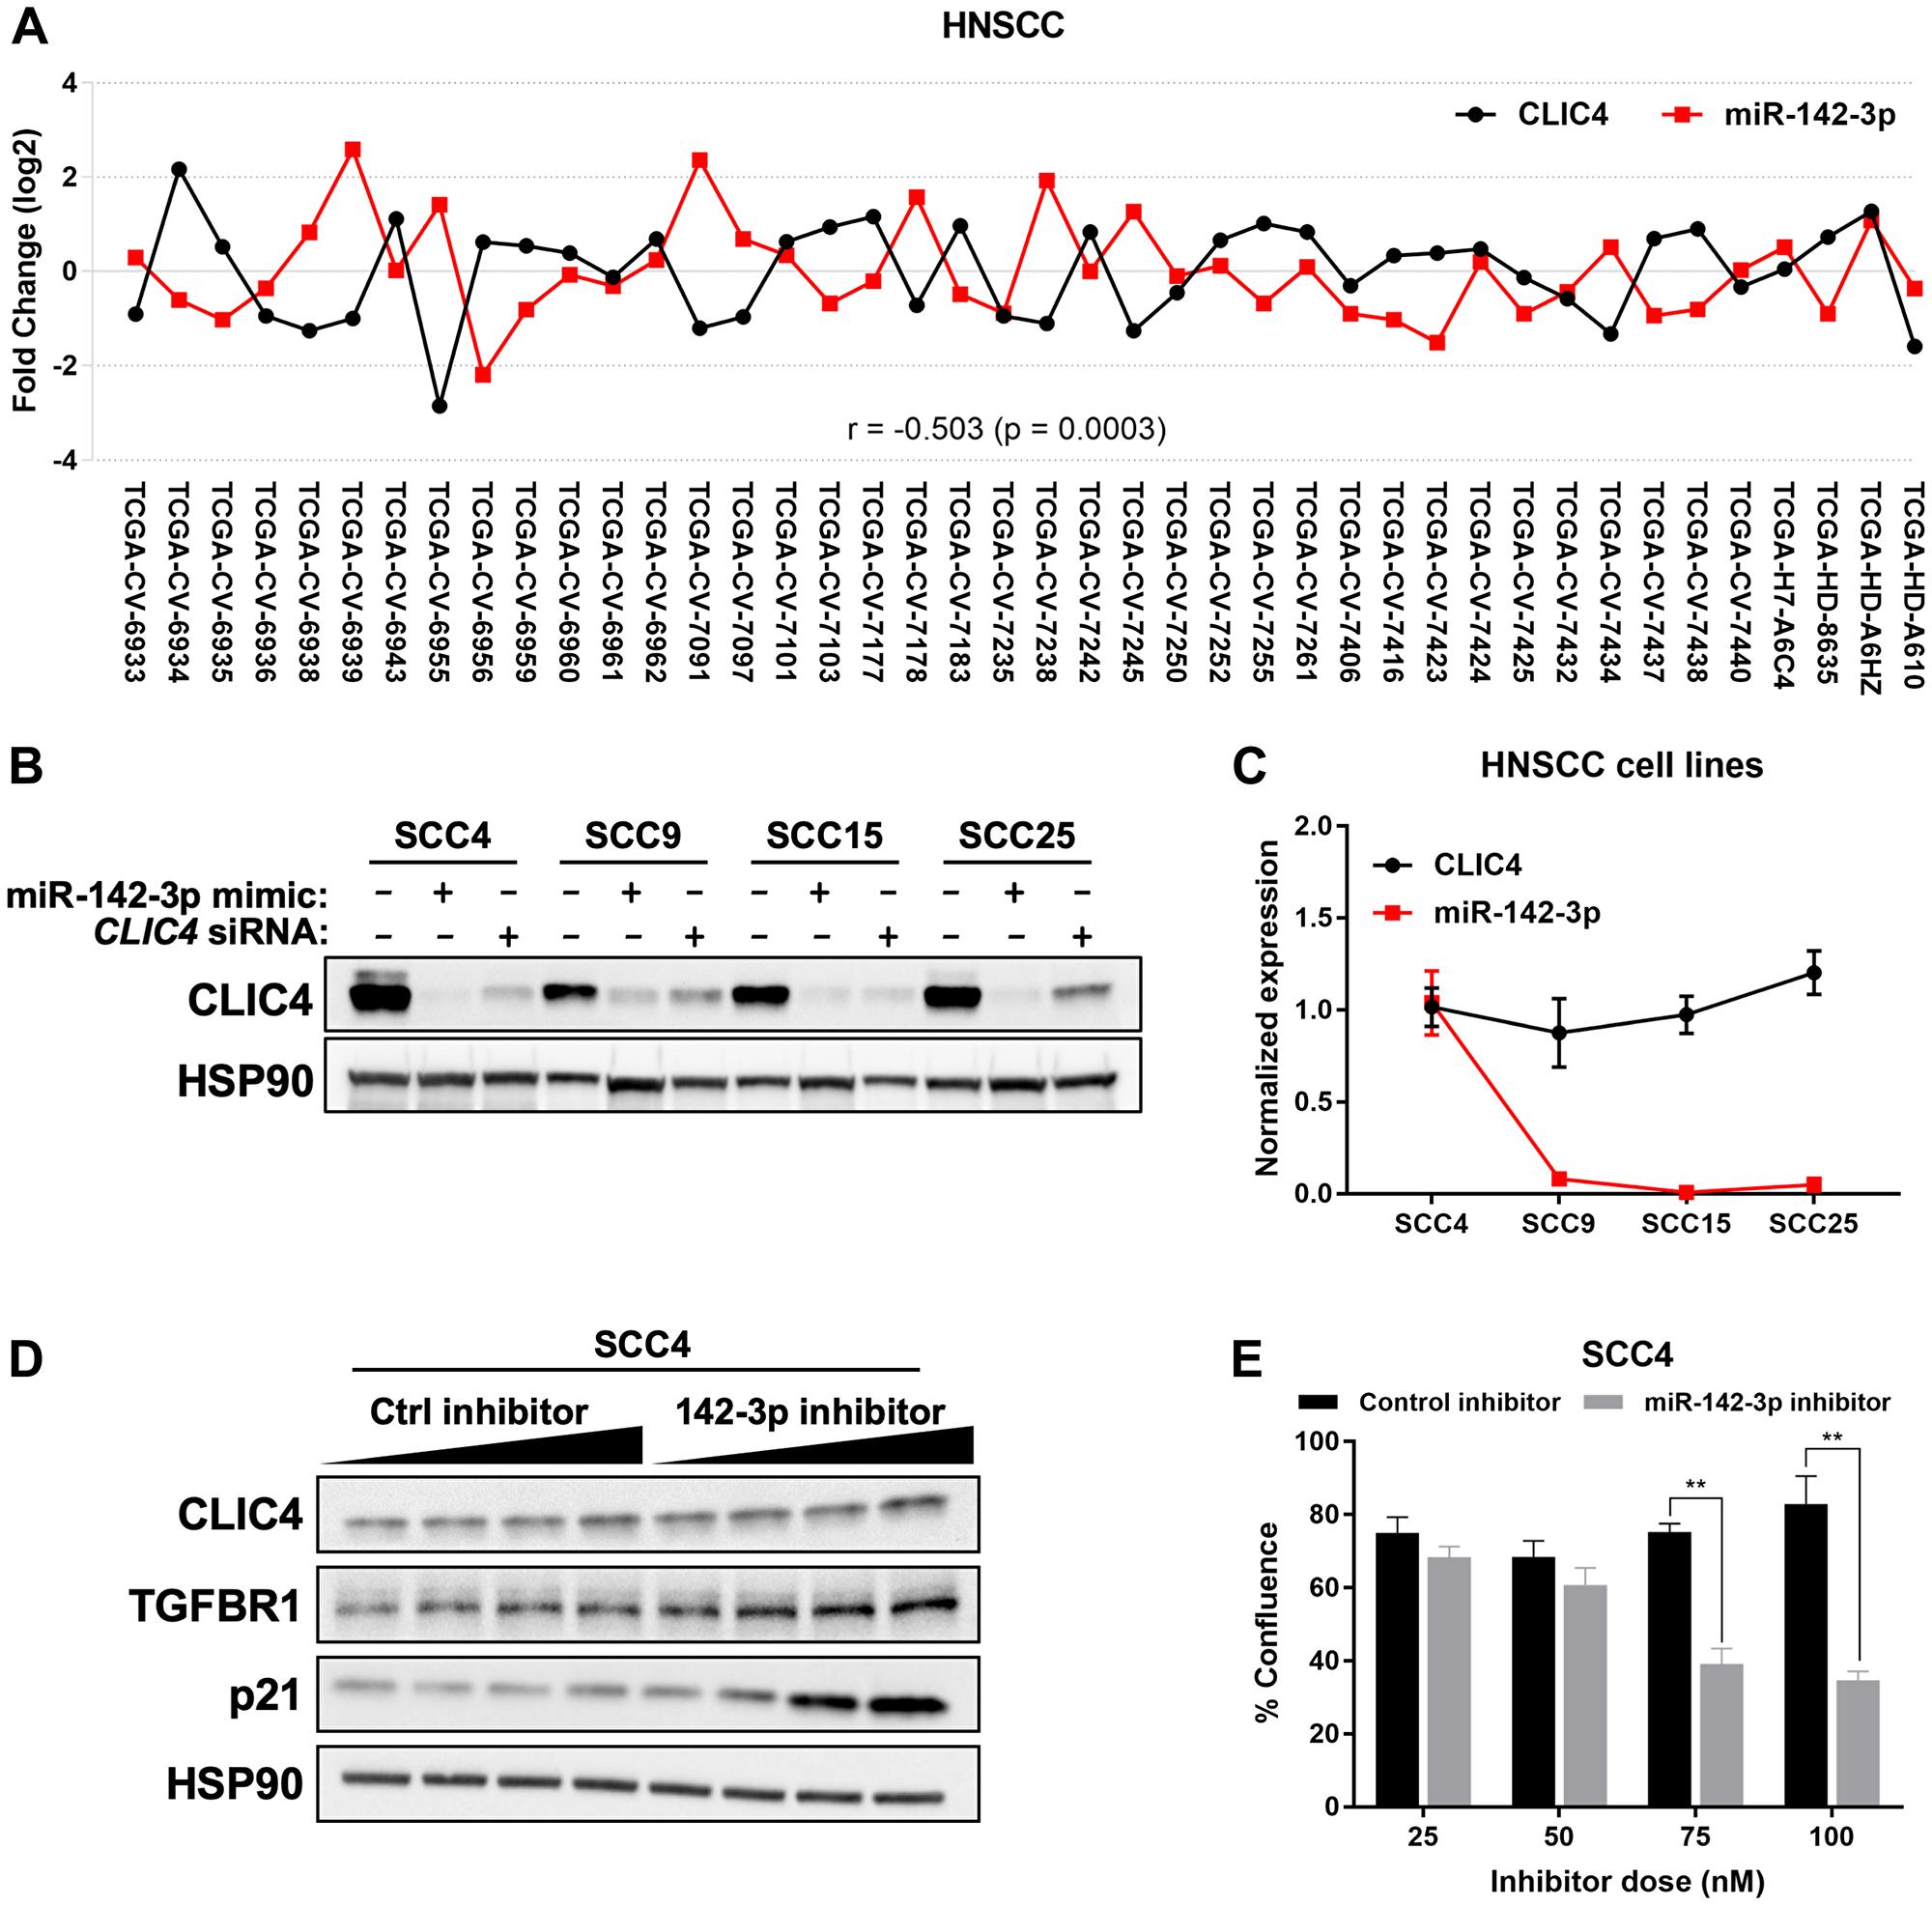 miR-142-3p modulates CLIC4 expression in HNSCC.